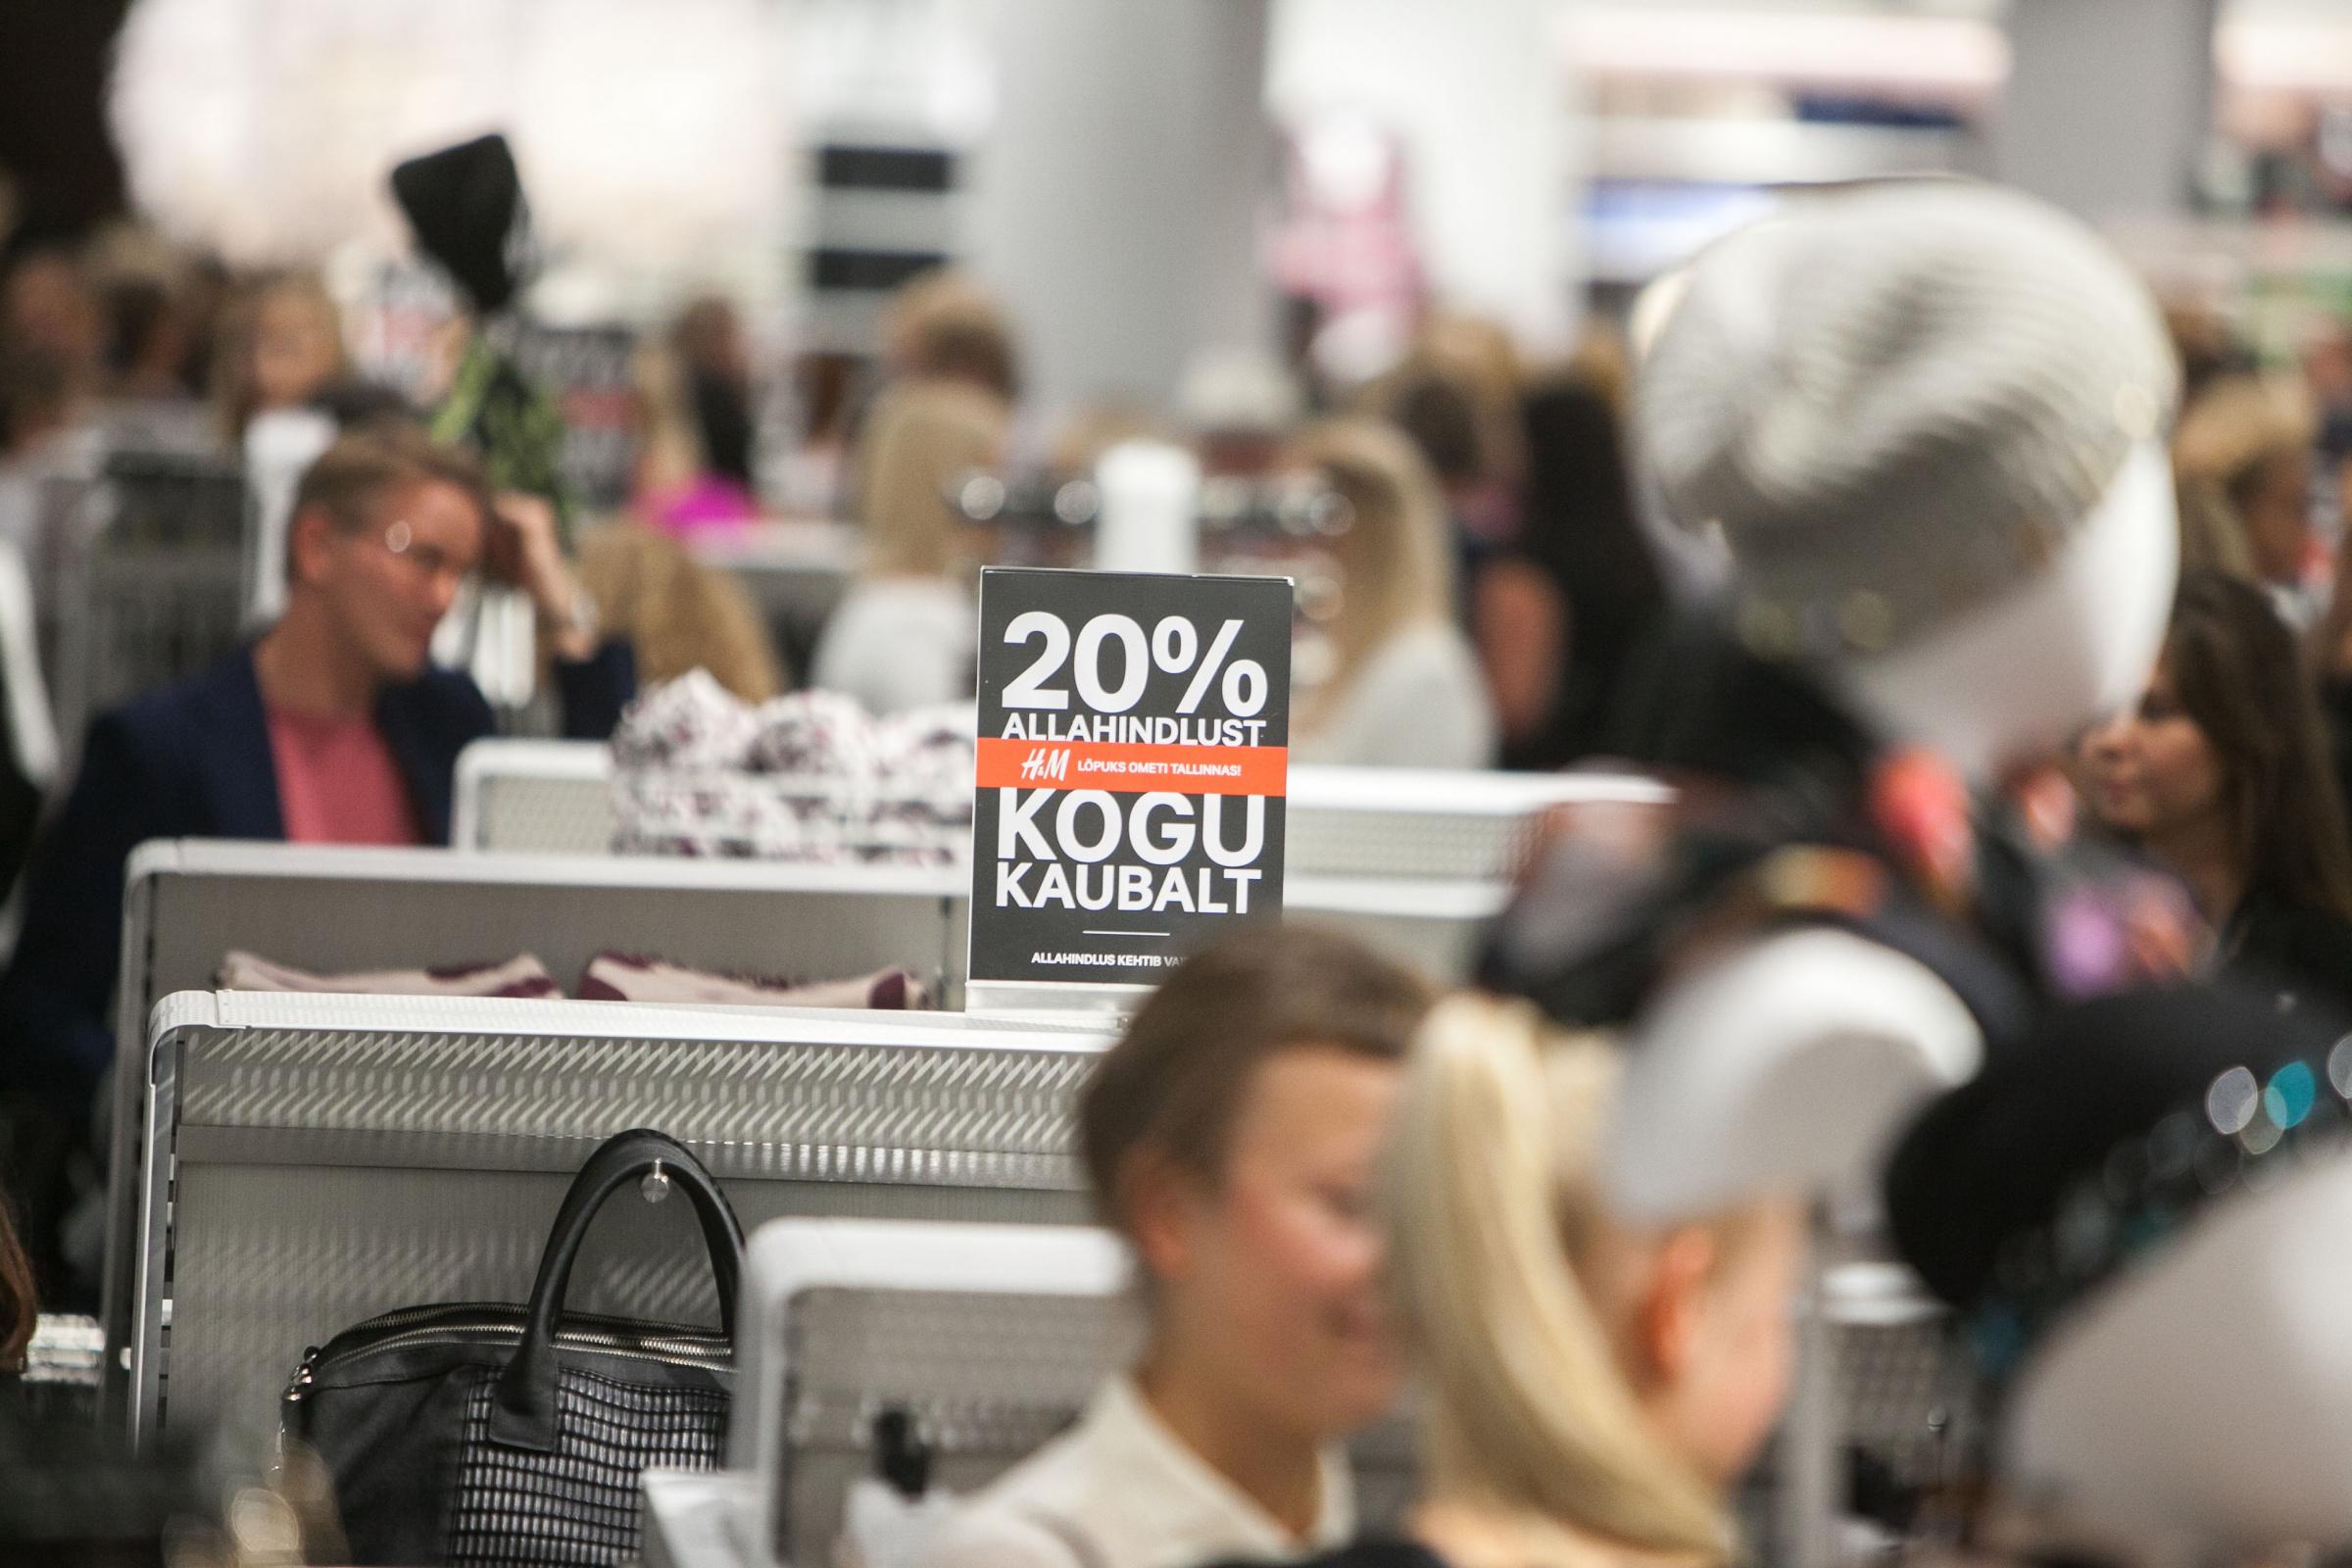 H&M Eesti, Hennes & Mauriz. Foto: TOOMAS TATAR/POSTIMEES/SCANPIX